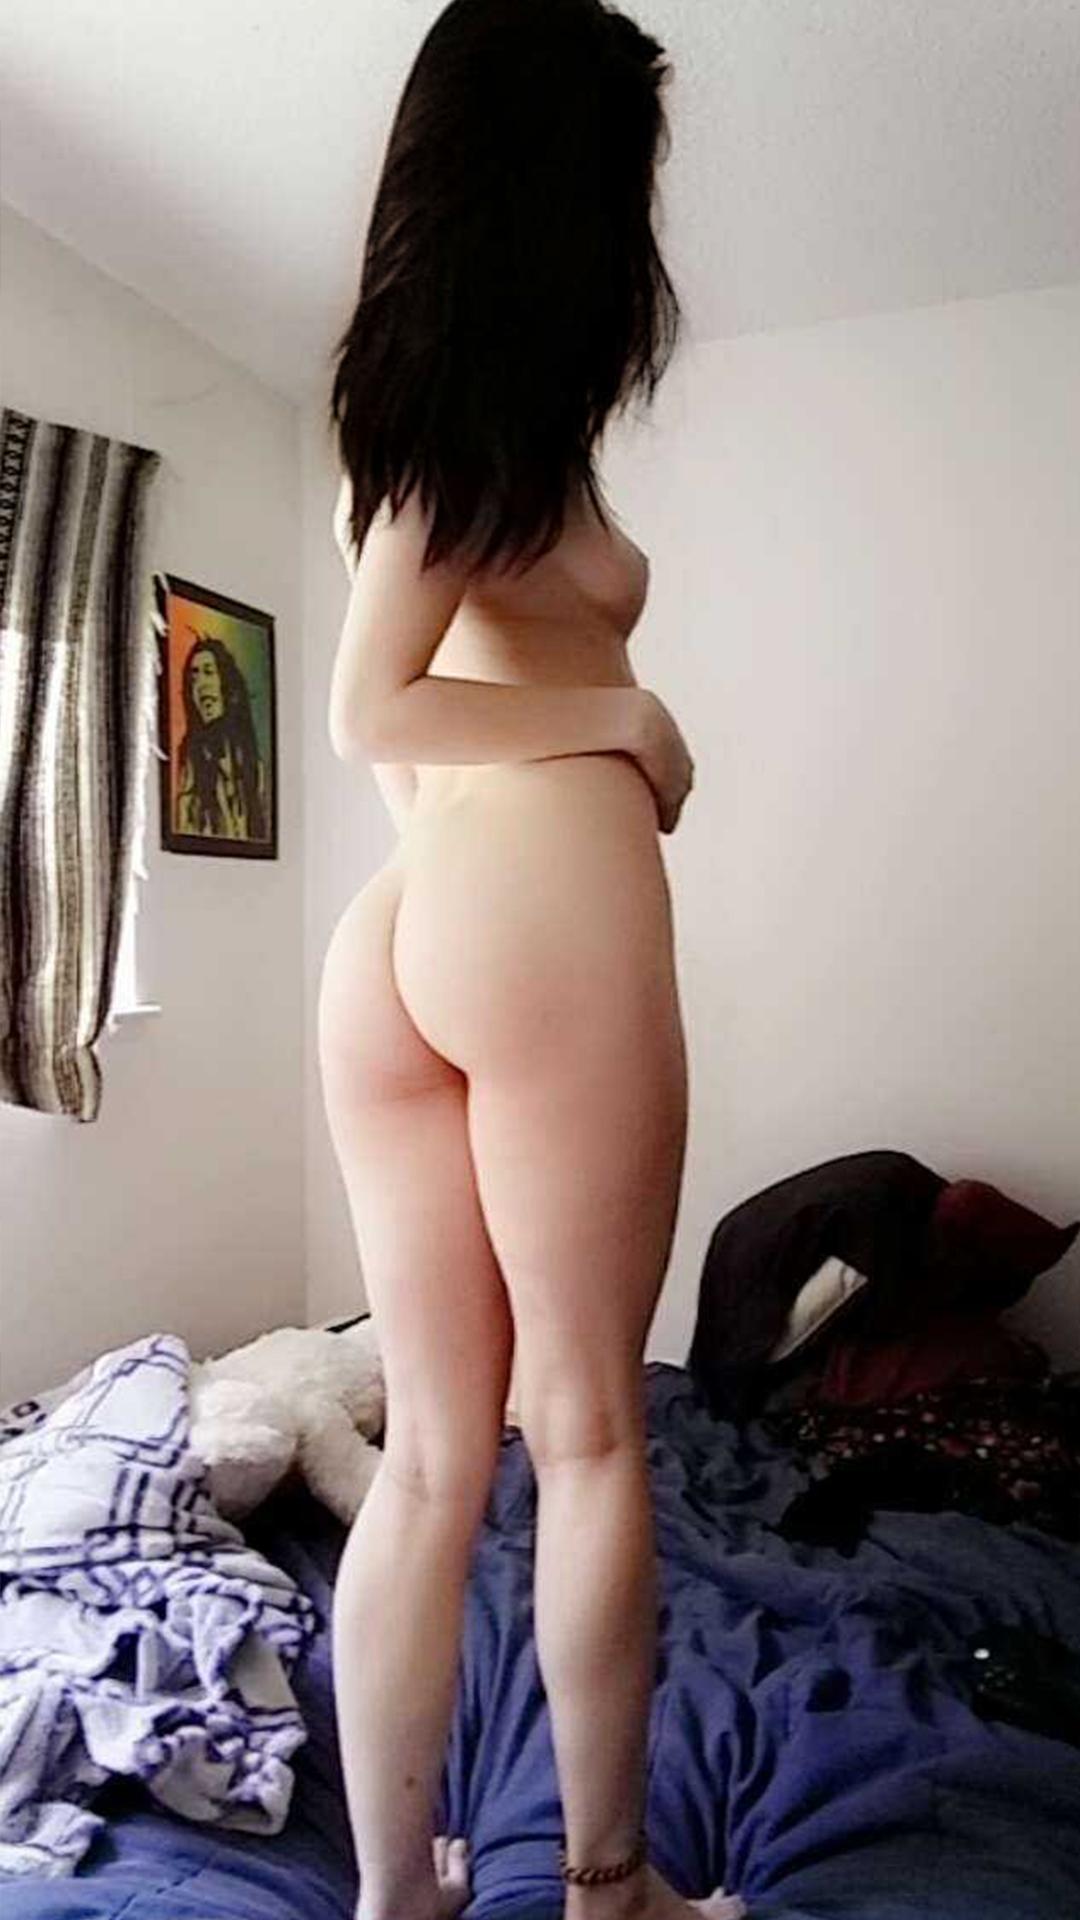 Im 4'9, Is It Too Short? ?